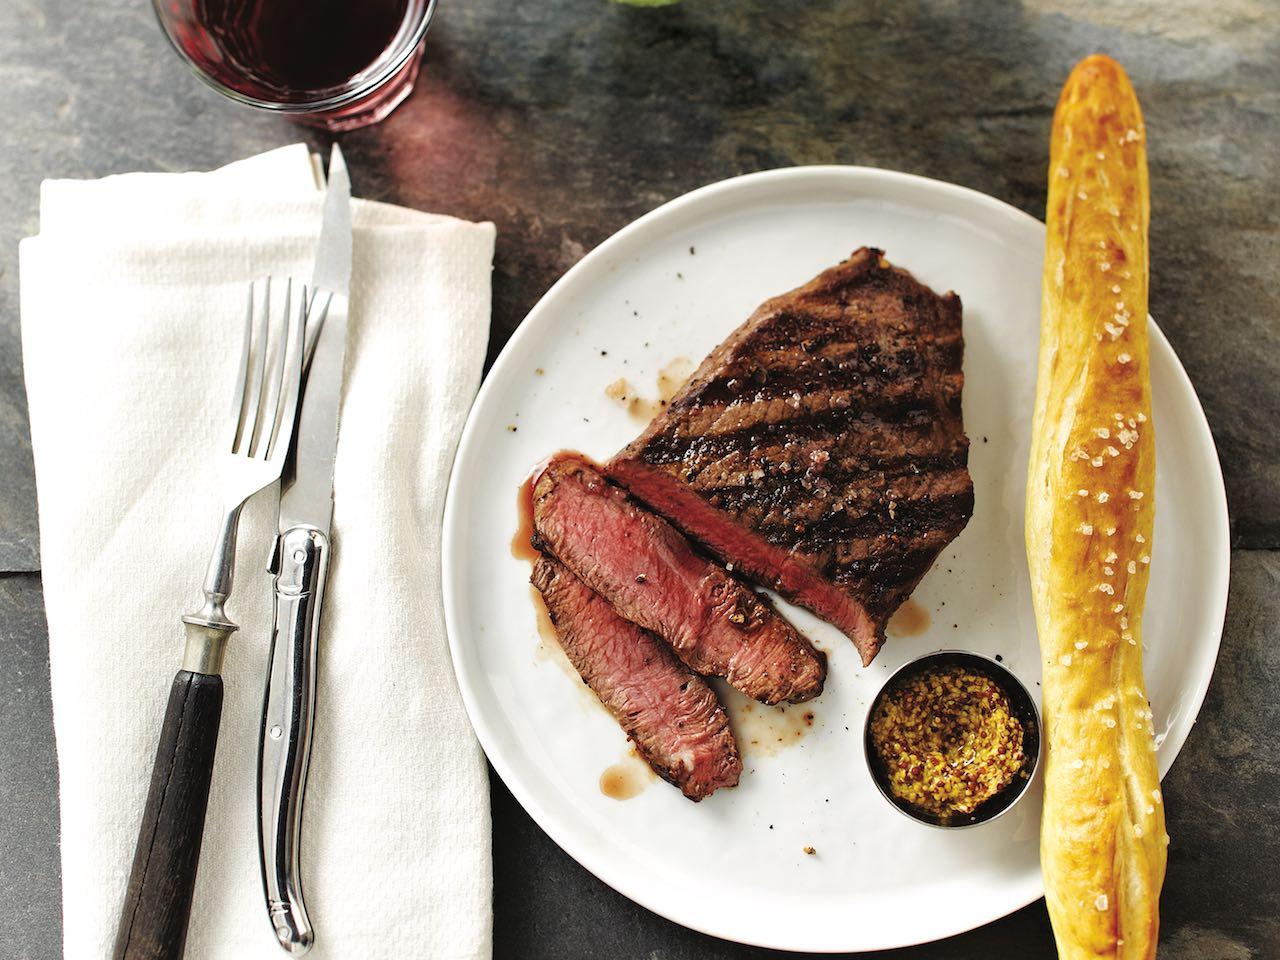 Flat iron steak cut with pretzel stick and mustard sauce